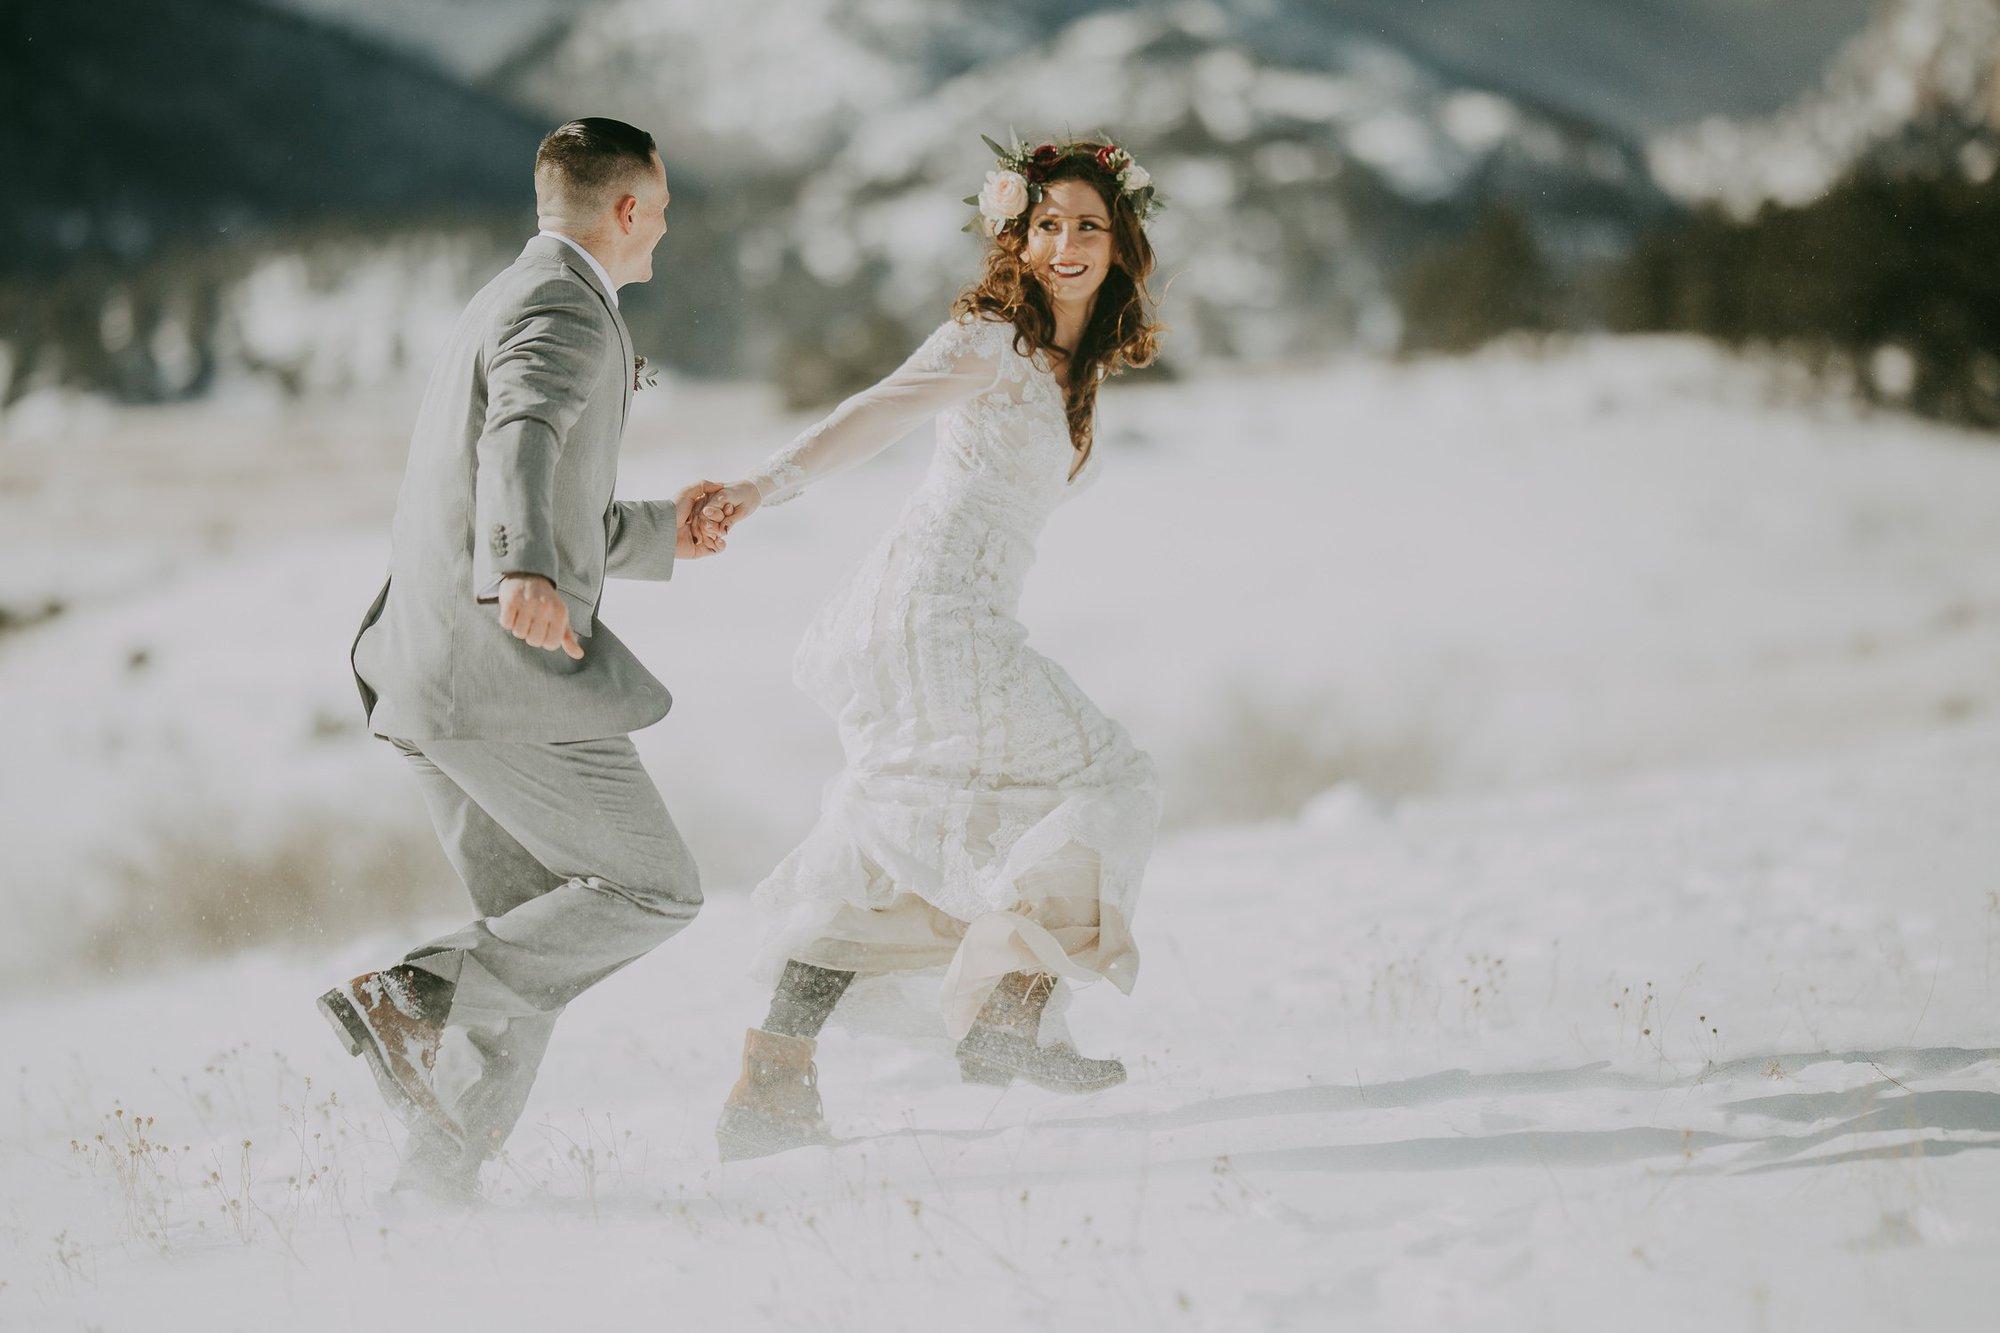 ROCKY MOUNTAIN ELOPEMENT PHOTOGRAPHY|SPRAGUE LAKE ELOPEMENT| JUSTYNA E BUTLER PHOTOGRAPHY | ROCKY MOUNTAIN NATIONAL PARK ENGAGEMENT |COLORADO MOUNTAIN ELOPEMENT PHOTOGRAPHER